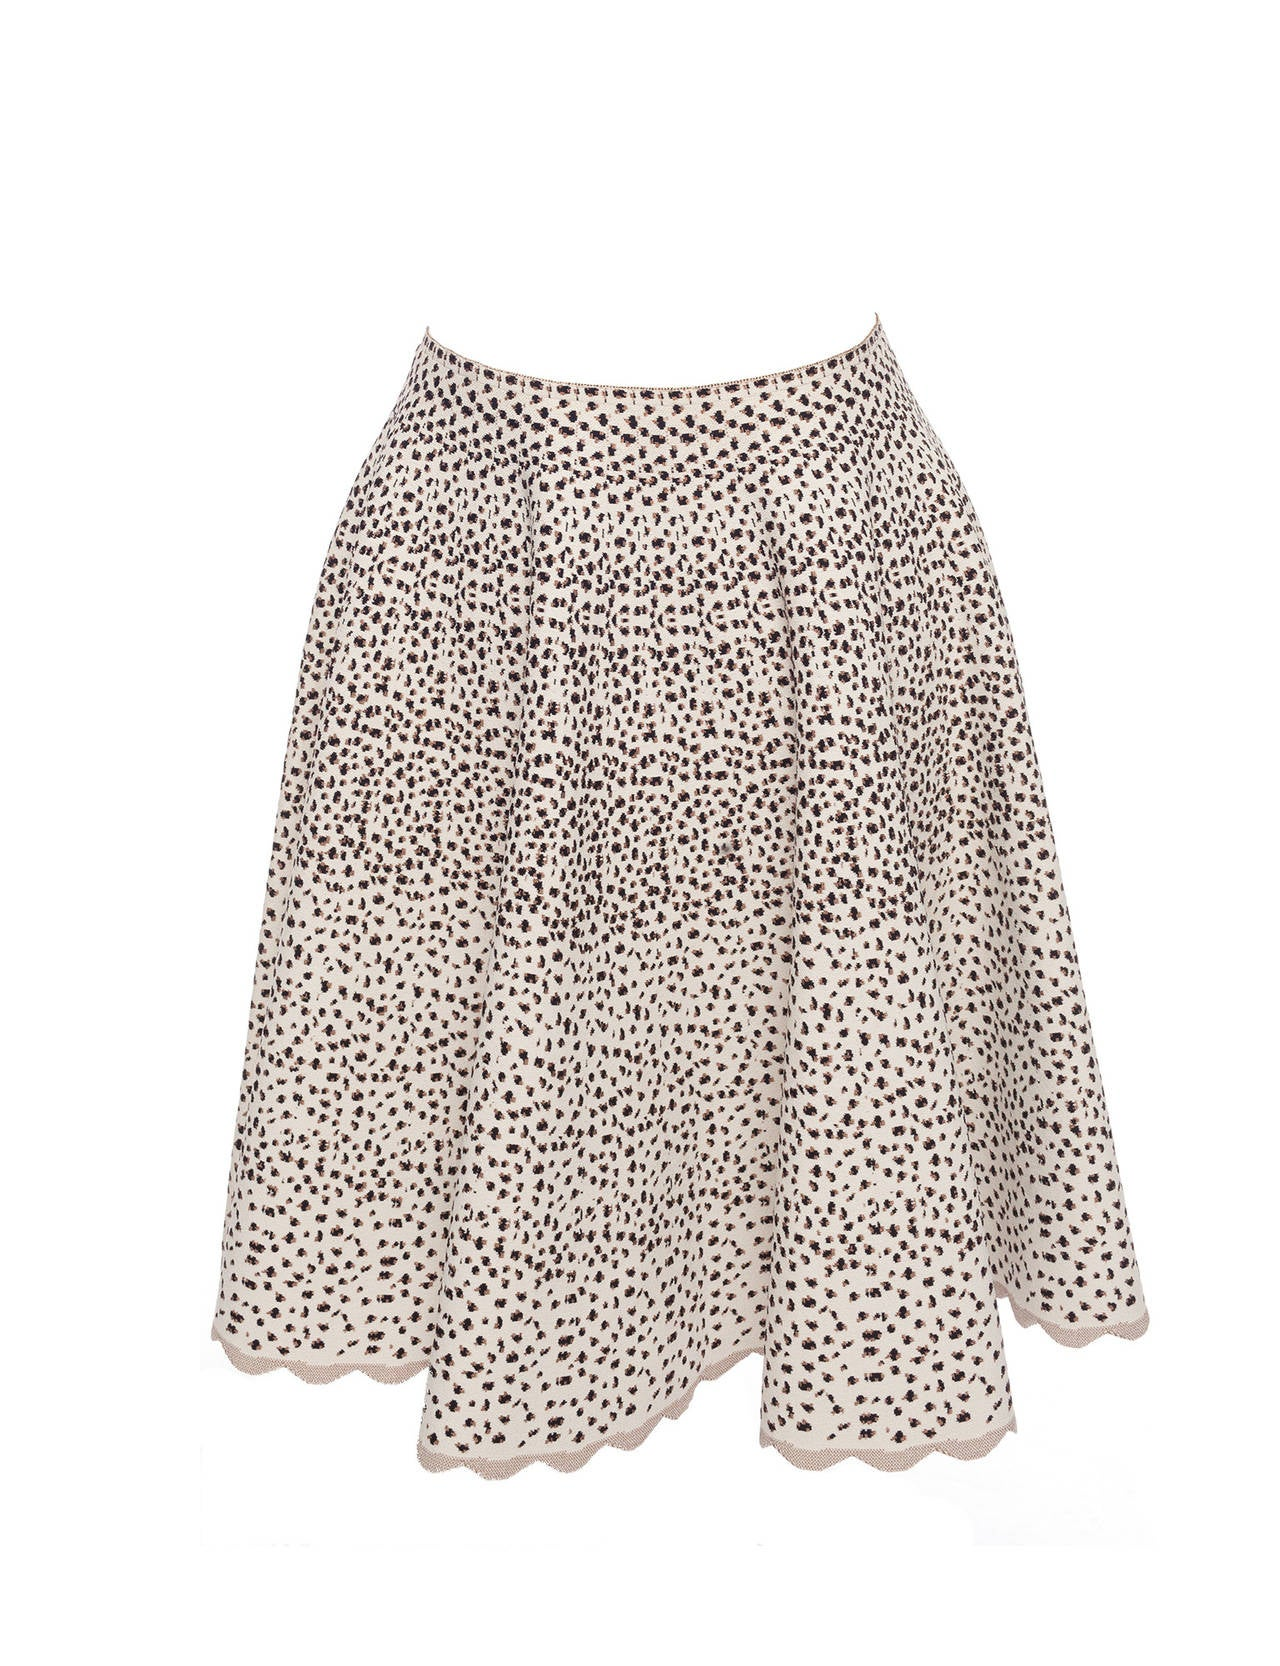 90s Alaia Paris aline knitted cheetah pattern skirt, Sz. M at 1stdibs